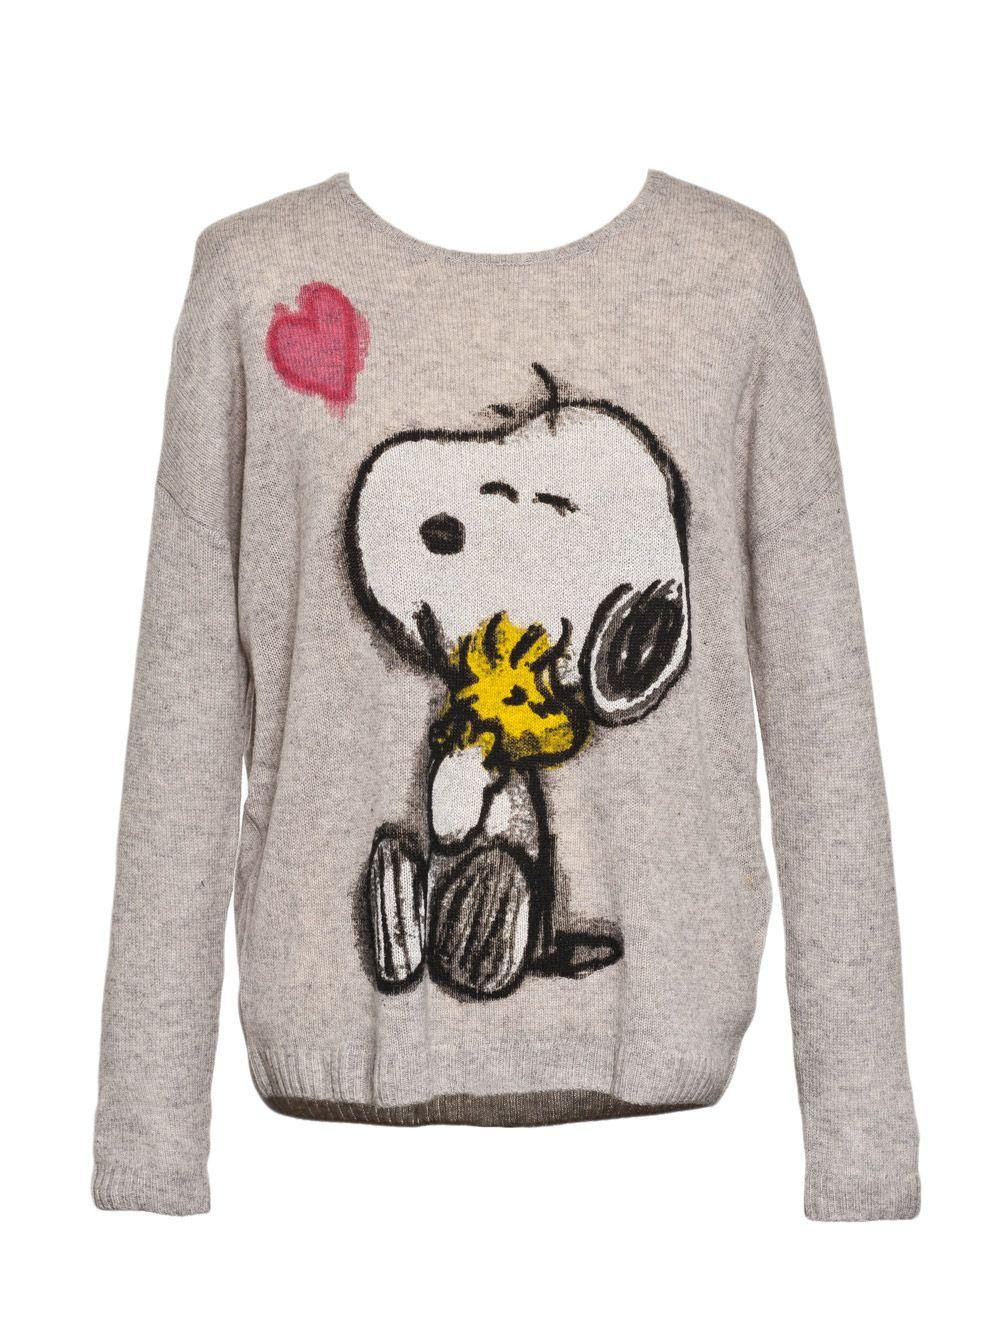 Princess Goes Hollywood Pullover Grau Mit Snoopy Graphic Sweatshirt Sweatshirts Pullover